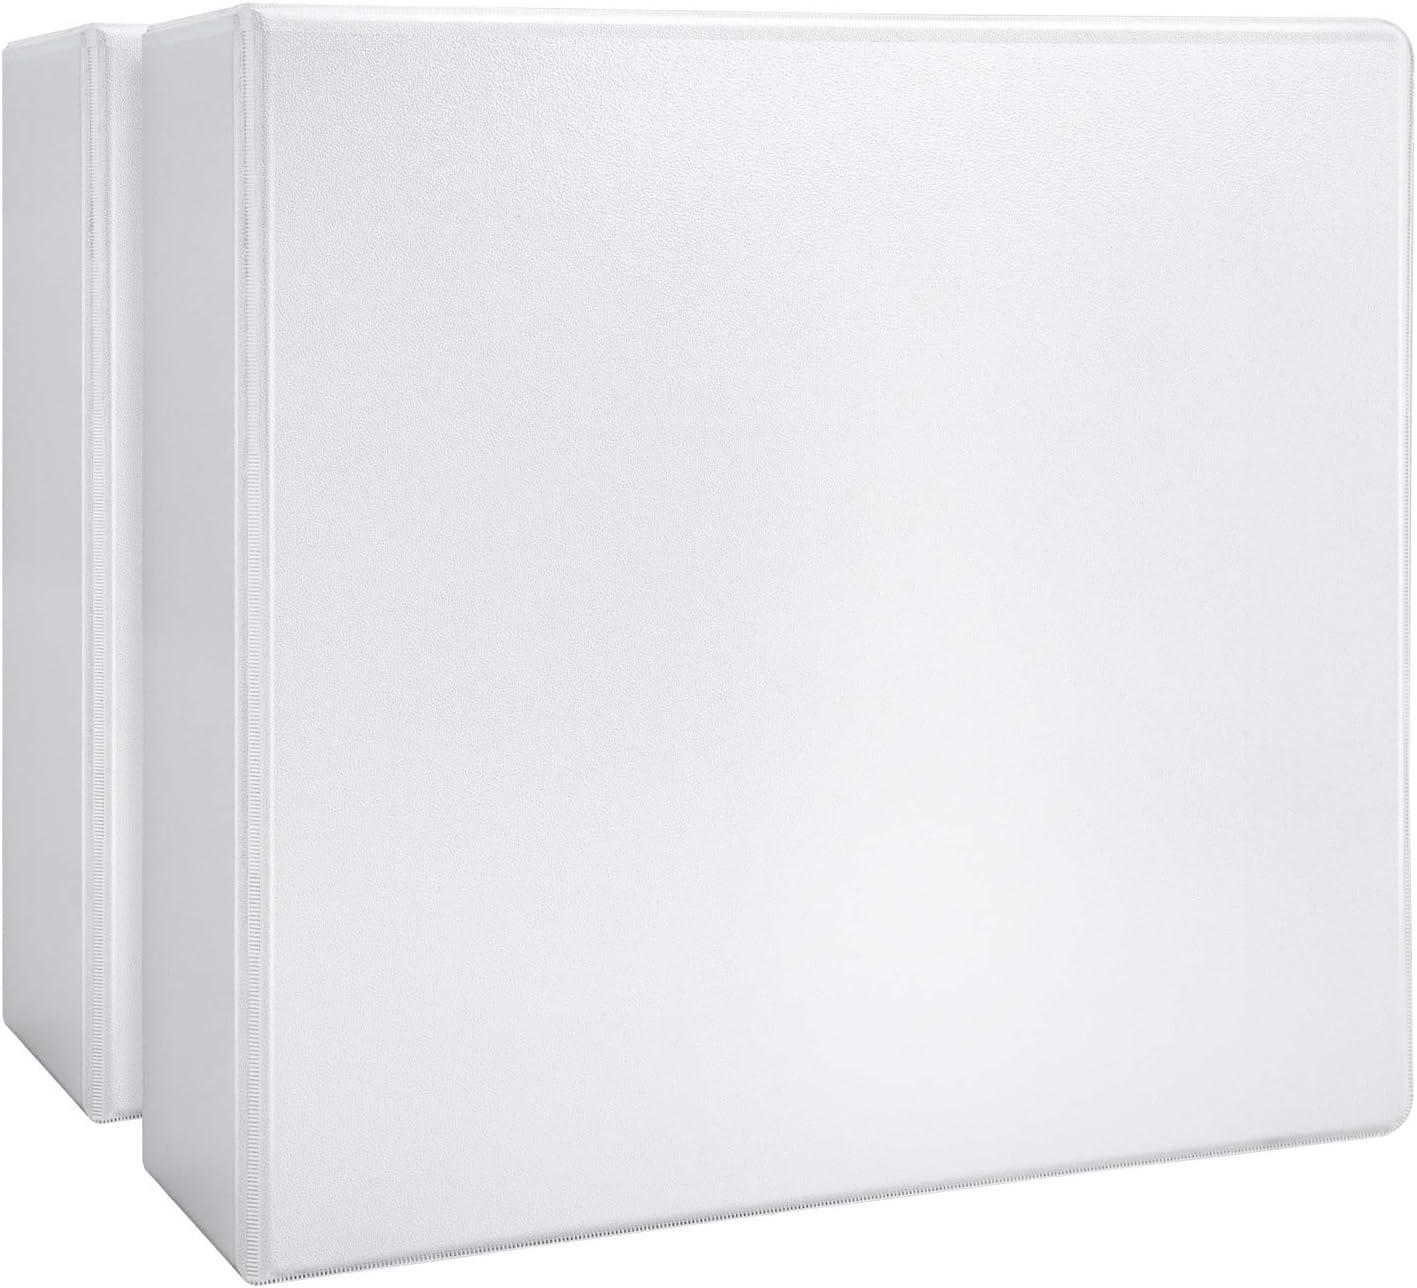 "AmazonBasics 4"" Heavy-Duty View 3 Ring Binder, White, 2/Pack"